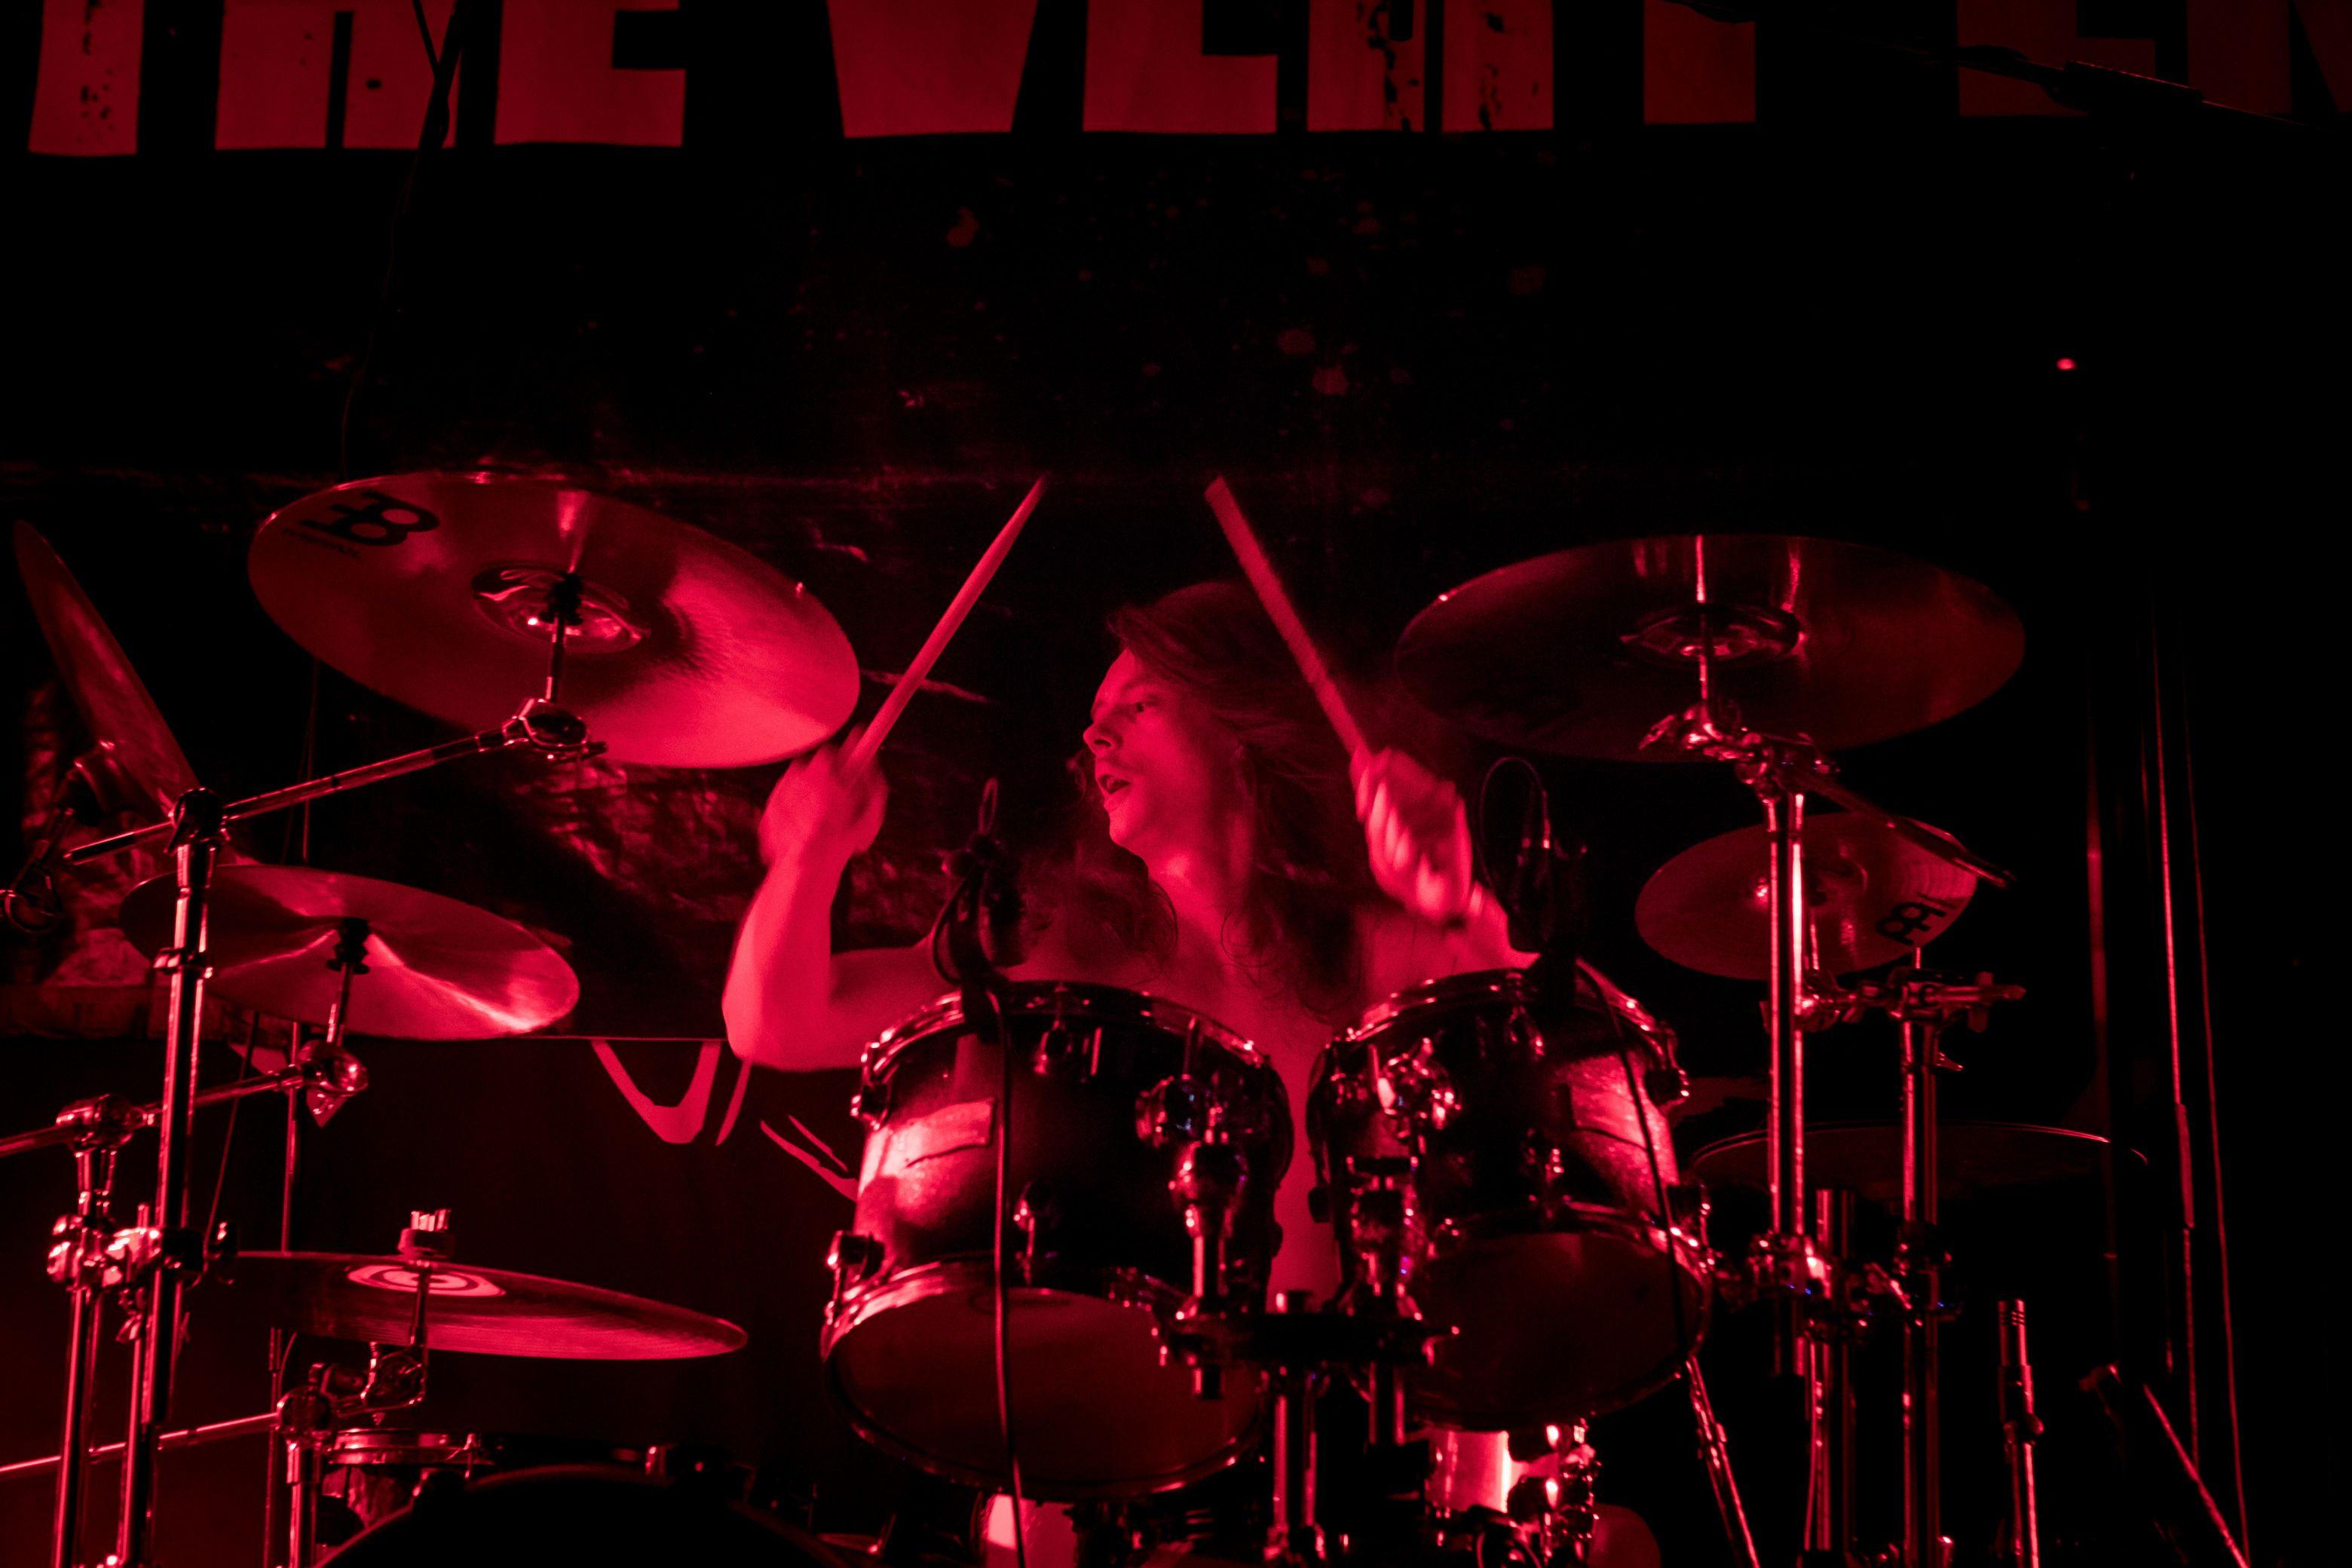 the-very-end-live-zeche-carl-essen-germany-thrash-metal_3